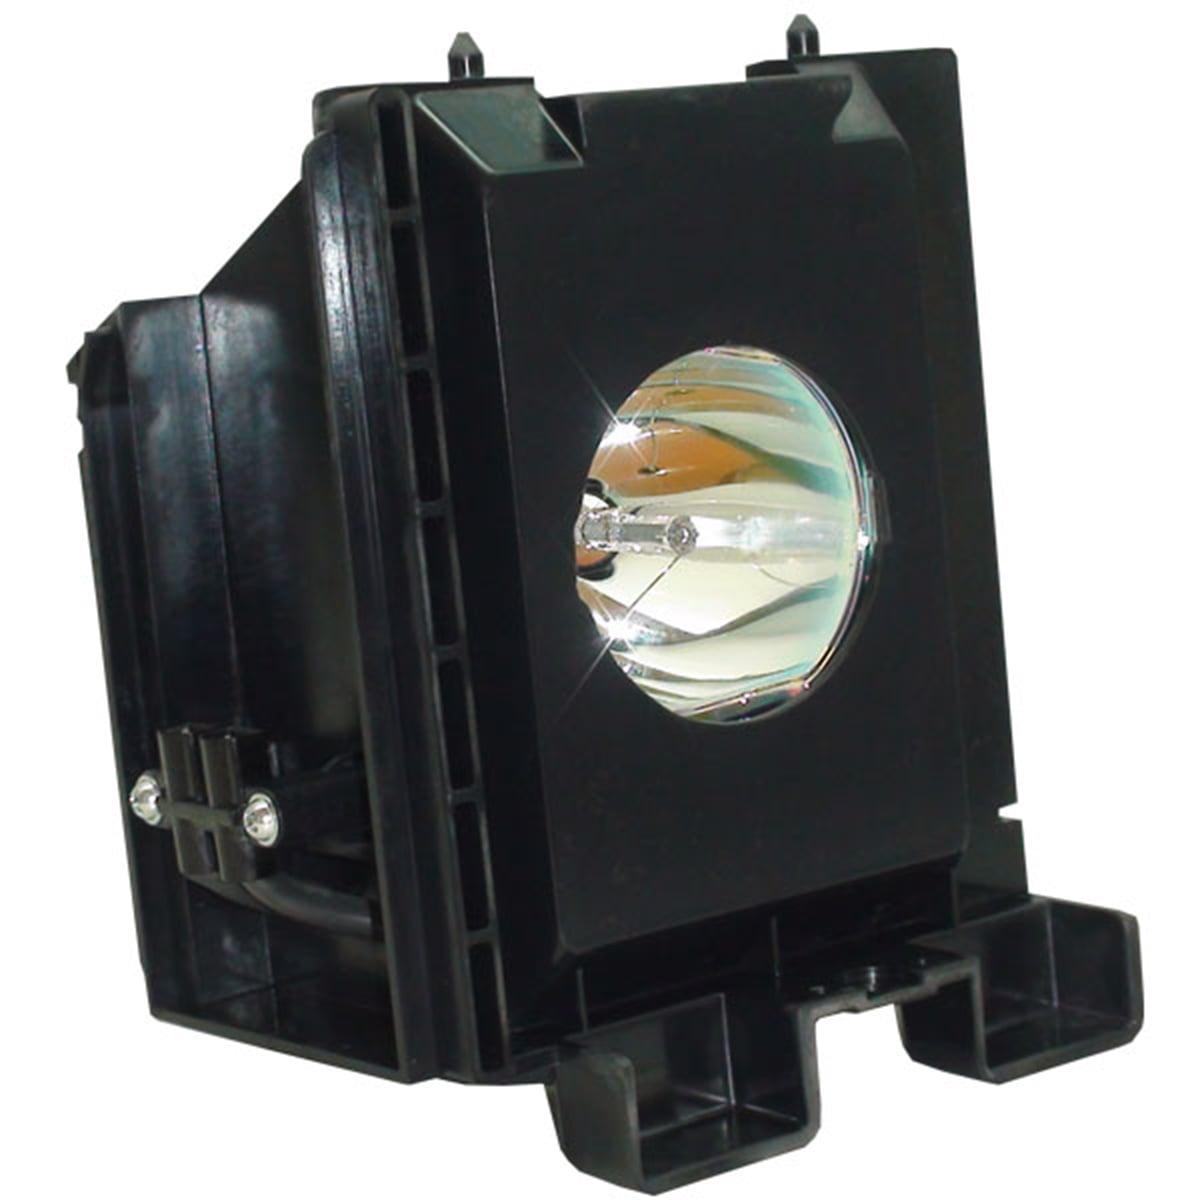 Lutema Platinum for Samsung HLP5063WX/XA TV Lamp with Housing (Original Philips Bulb Inside) - image 4 of 5